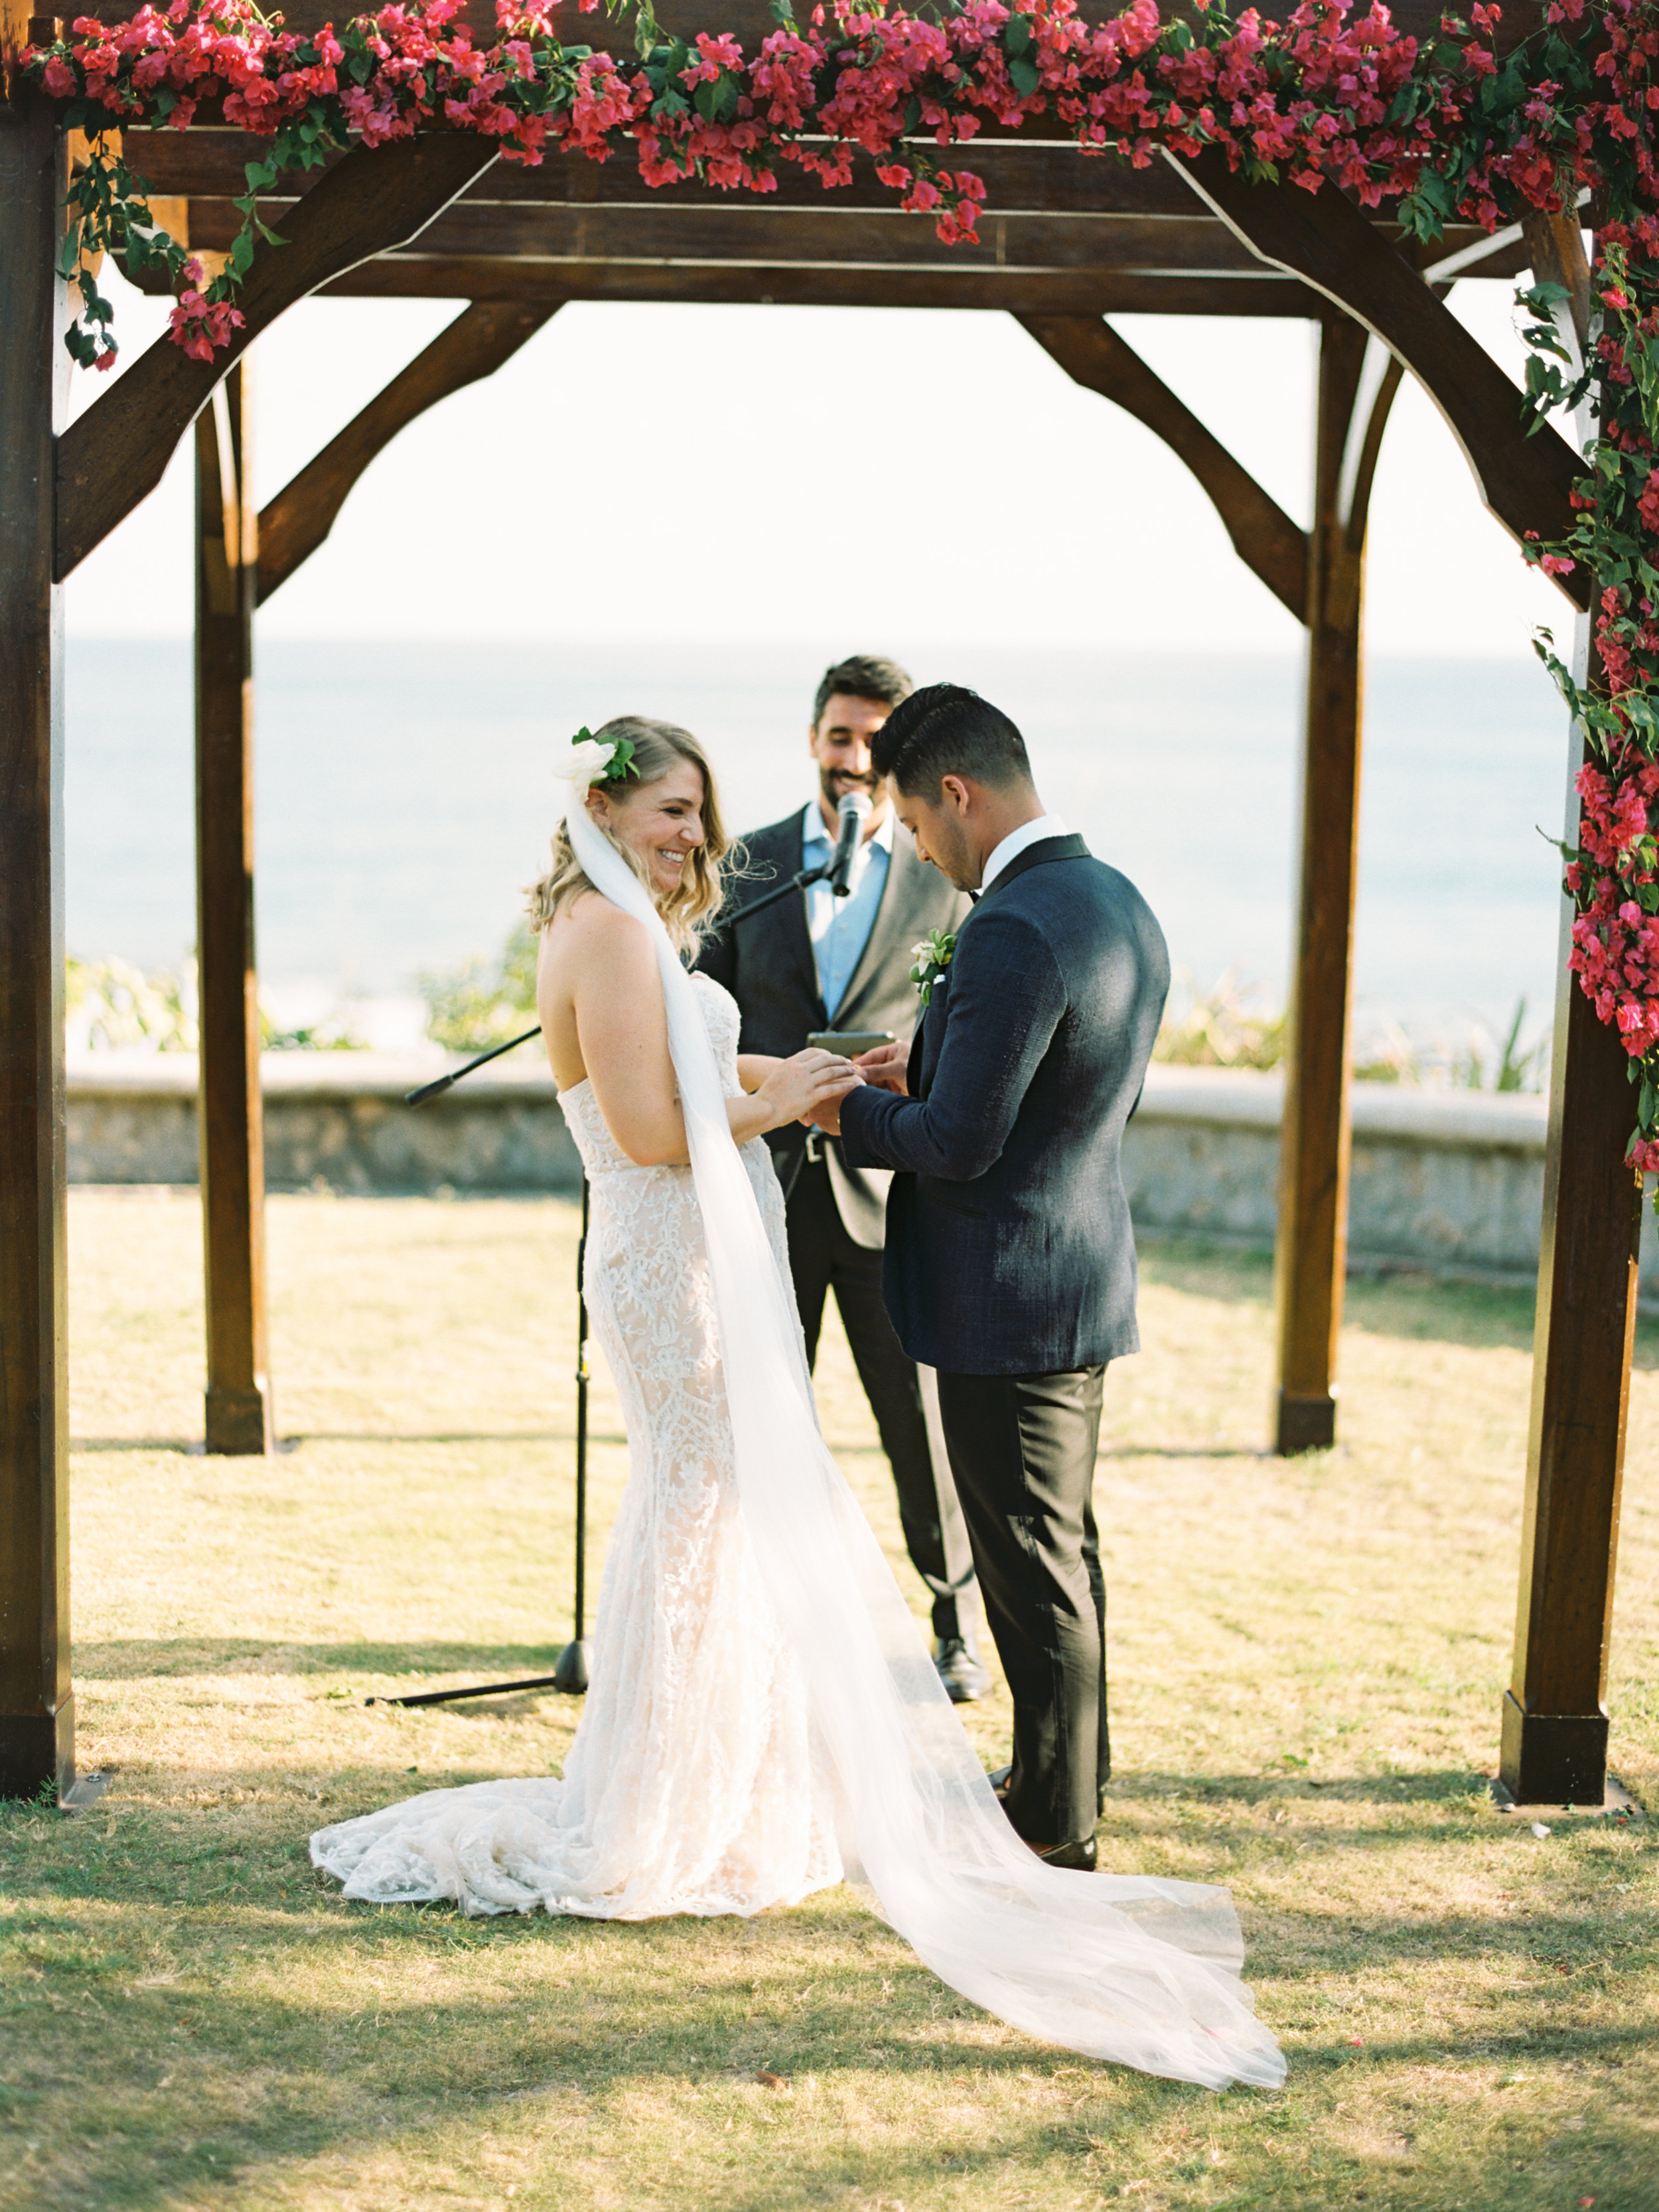 384-fine-art-film-photographer-destination-wedding-nicaragua-jacob+cammye-brumley & wells.jpg